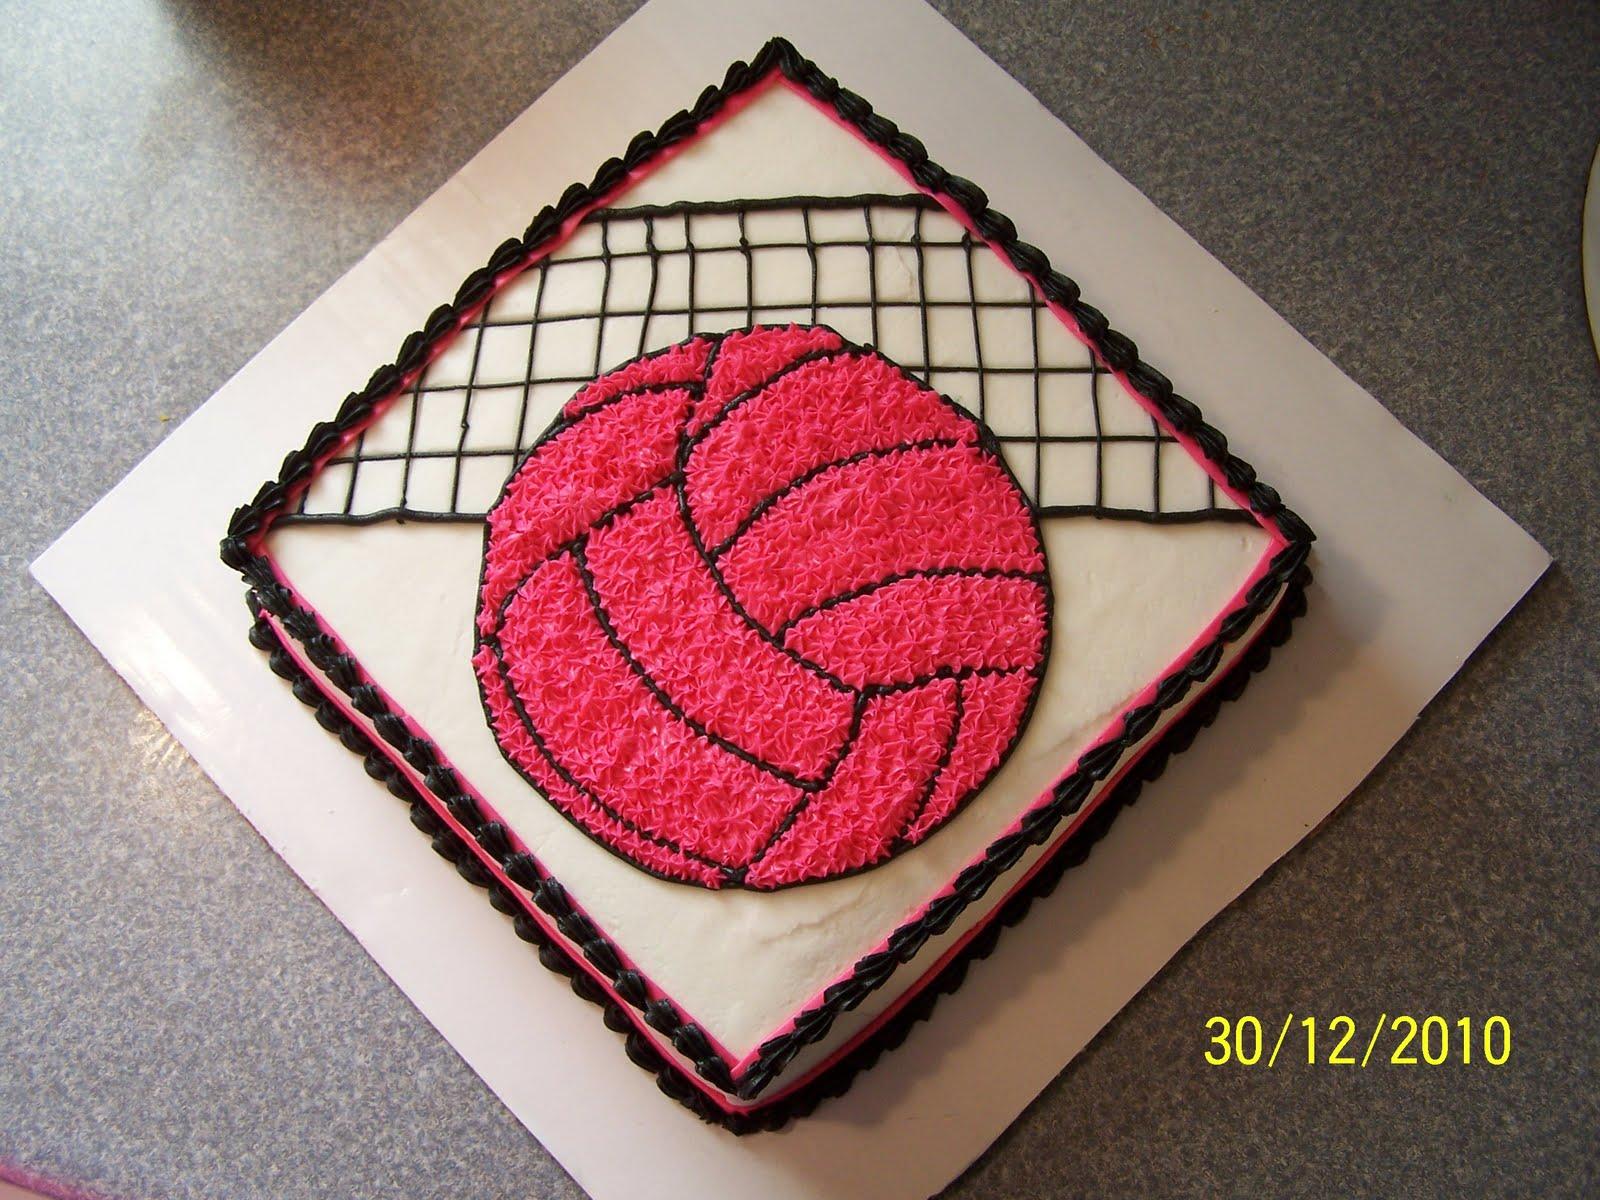 Edees Custom Cakes Volleyball Birthday